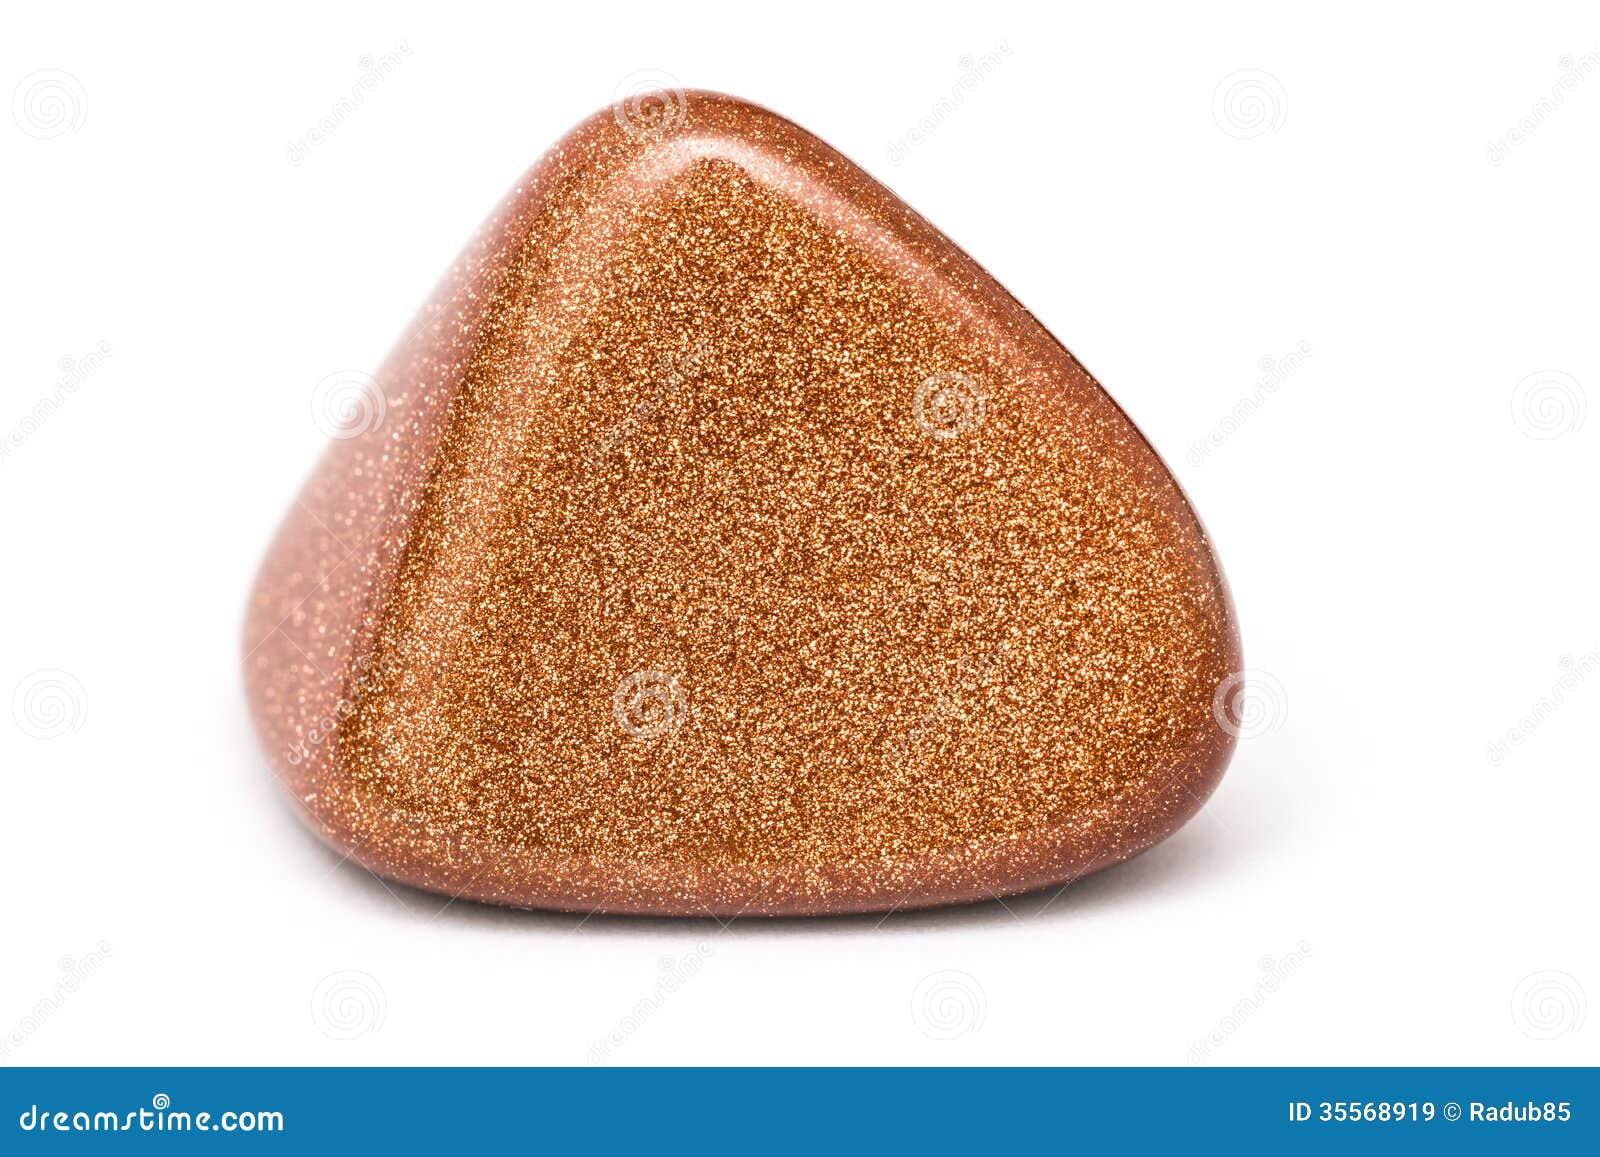 Image gallery shiny stone for Shiny black granite rocks